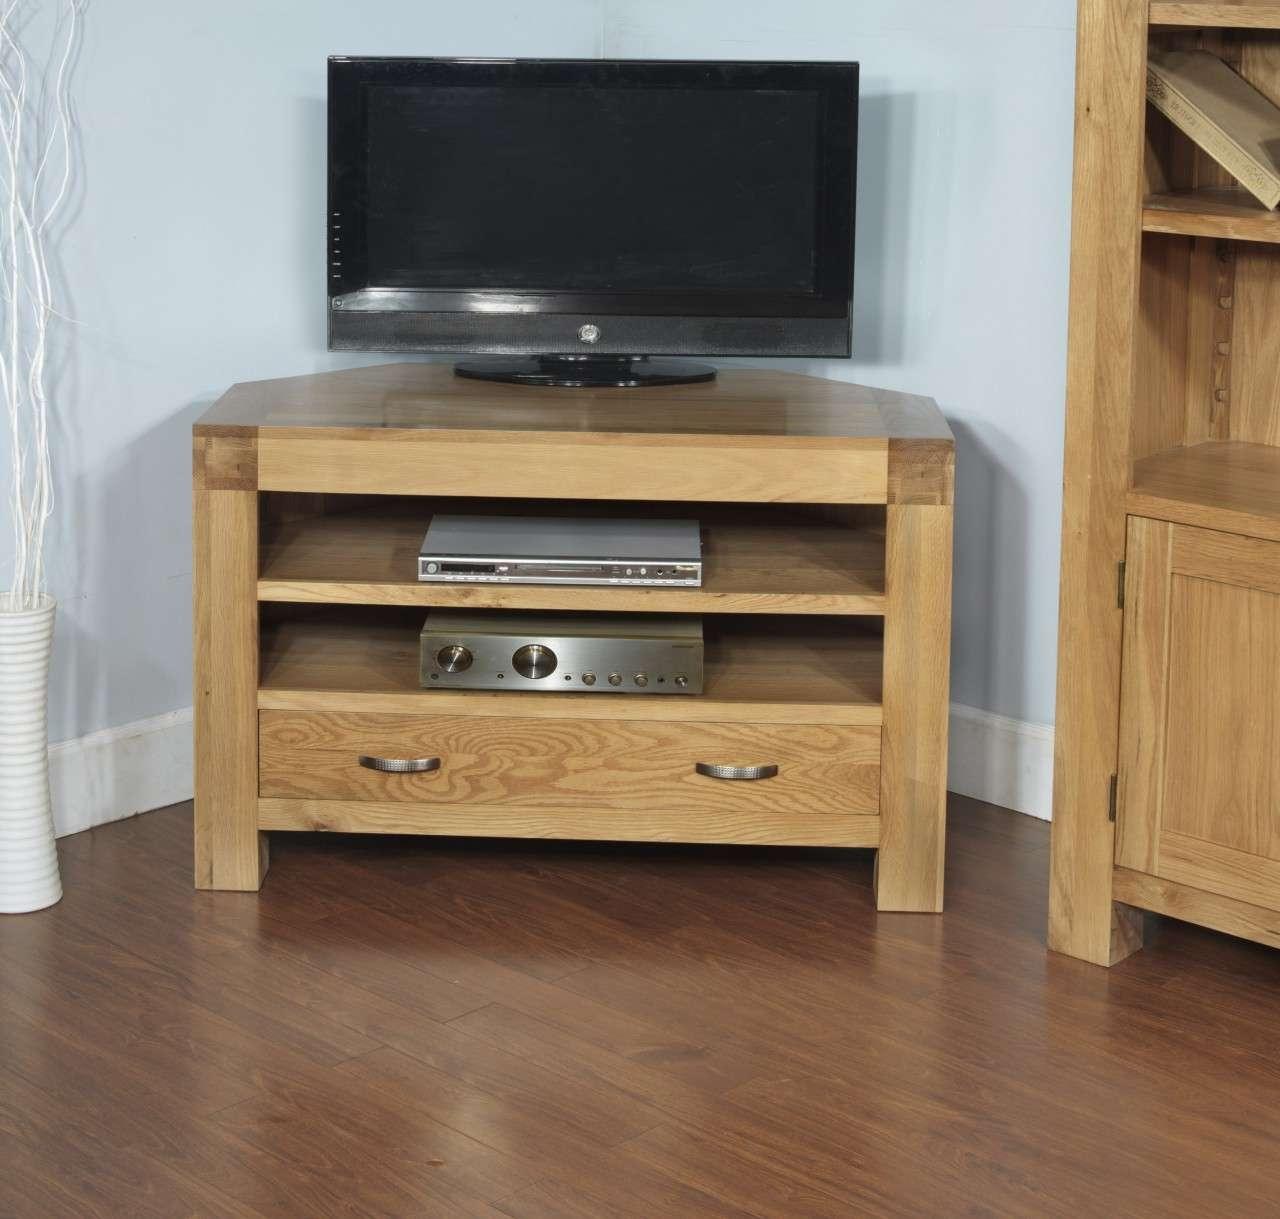 Rivermead Solid Oak Modern Furniture Widescreen Corner Tv Cabinet Regarding Real Wood Corner Tv Stands (View 13 of 15)